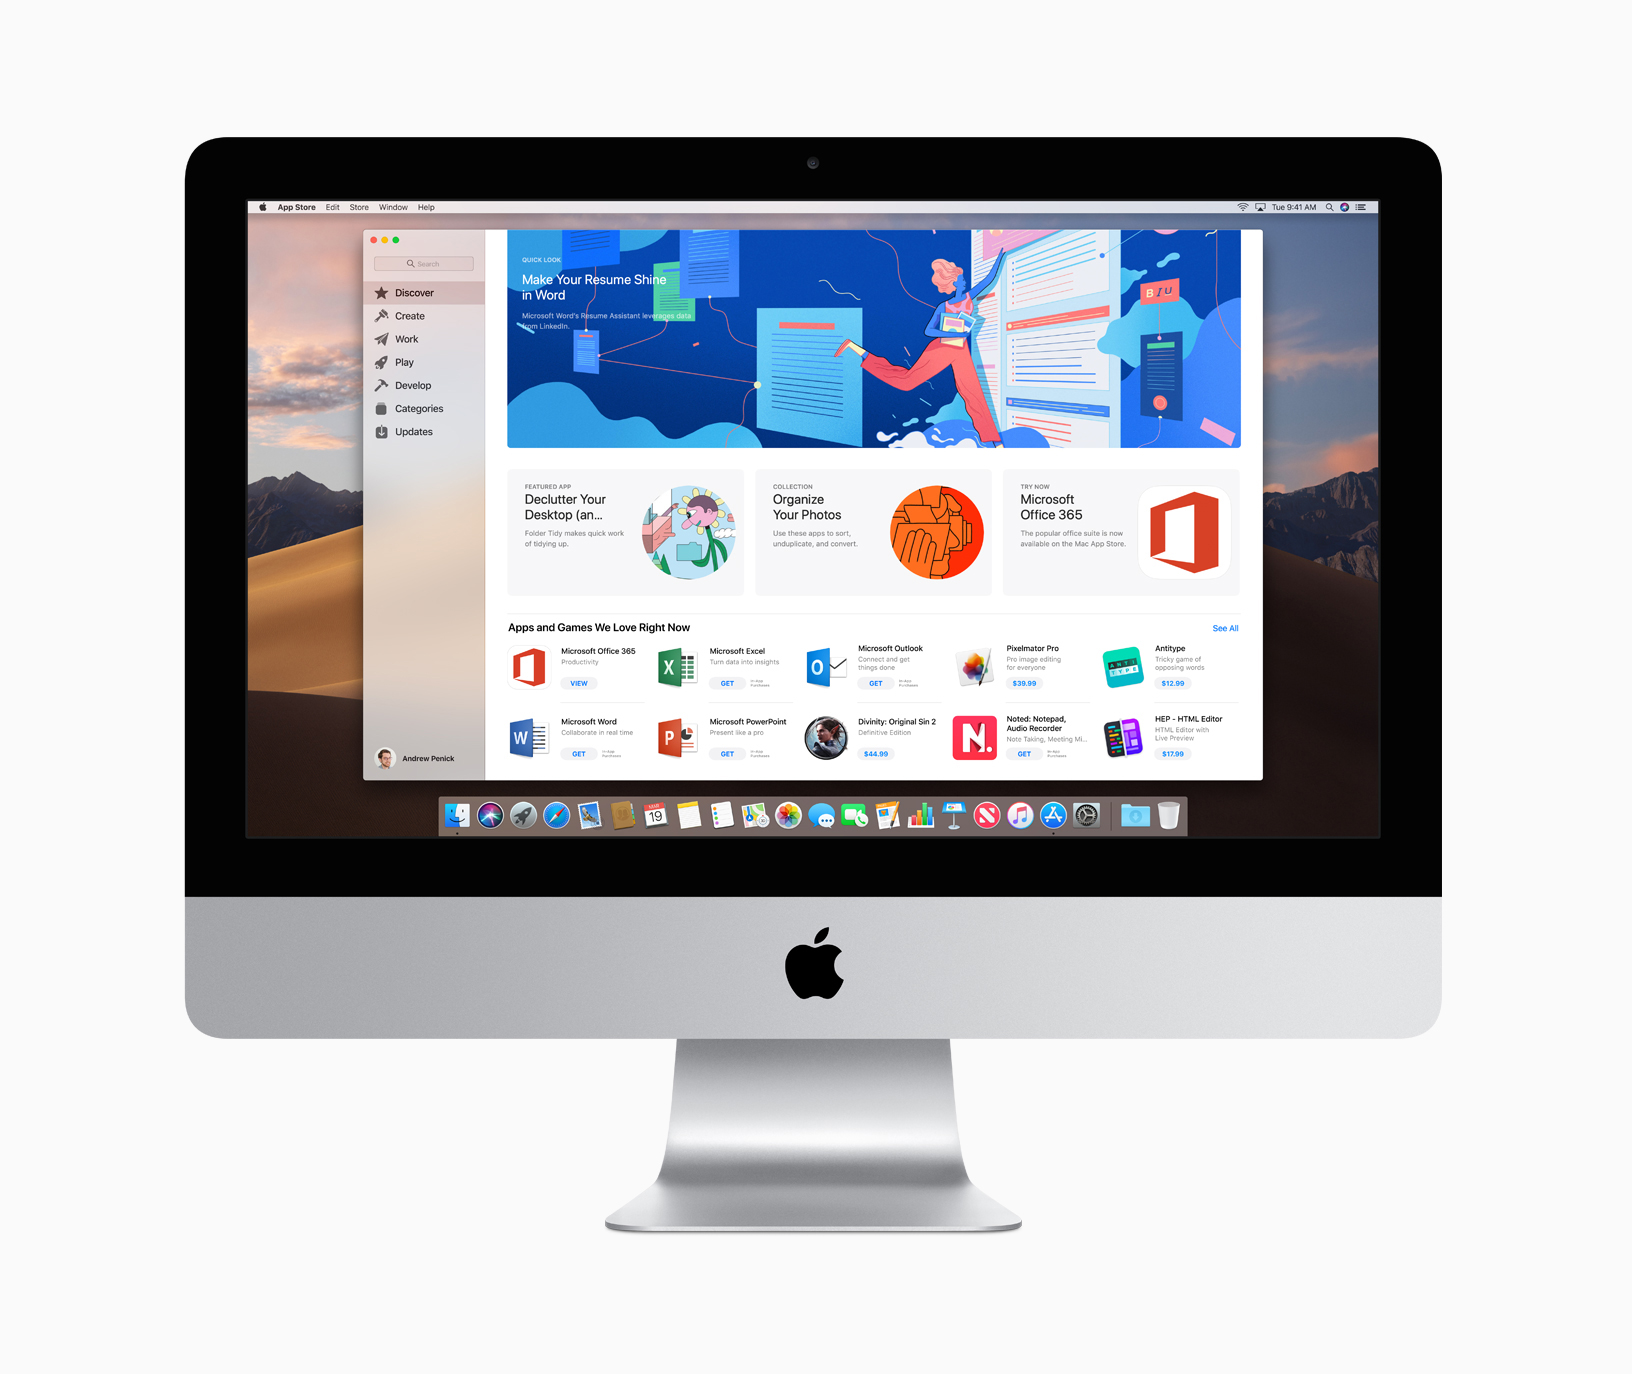 https://www.apple.com/newsroom/images/product/mac/standard/Apple-iMac-gets-2x-more-performance-Mac-app-store-03192019_big_carousel.jpg.large_2x.jpg